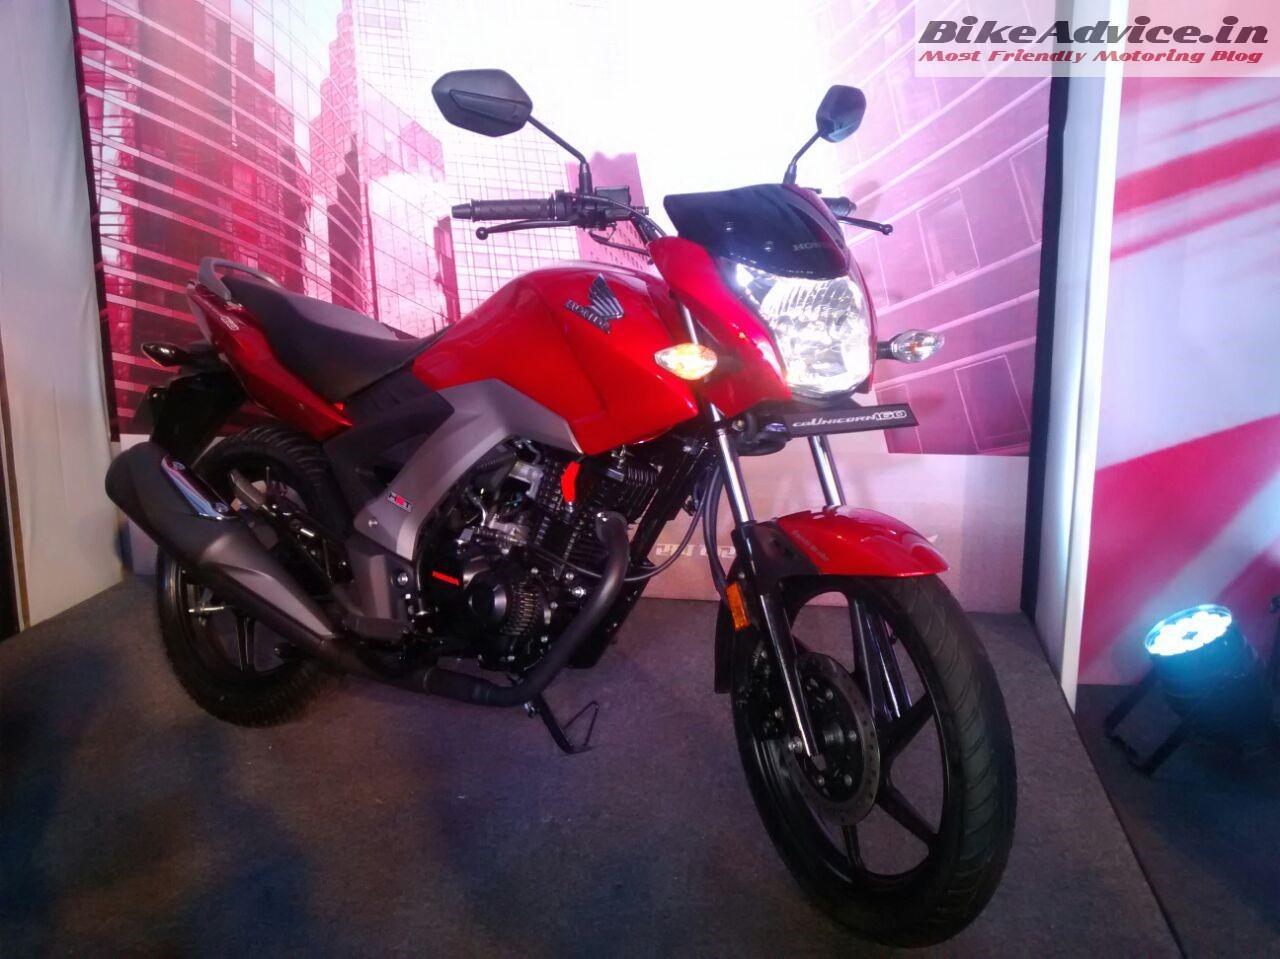 New Powerful Honda Unicorn 160 Launched Price Engine Details